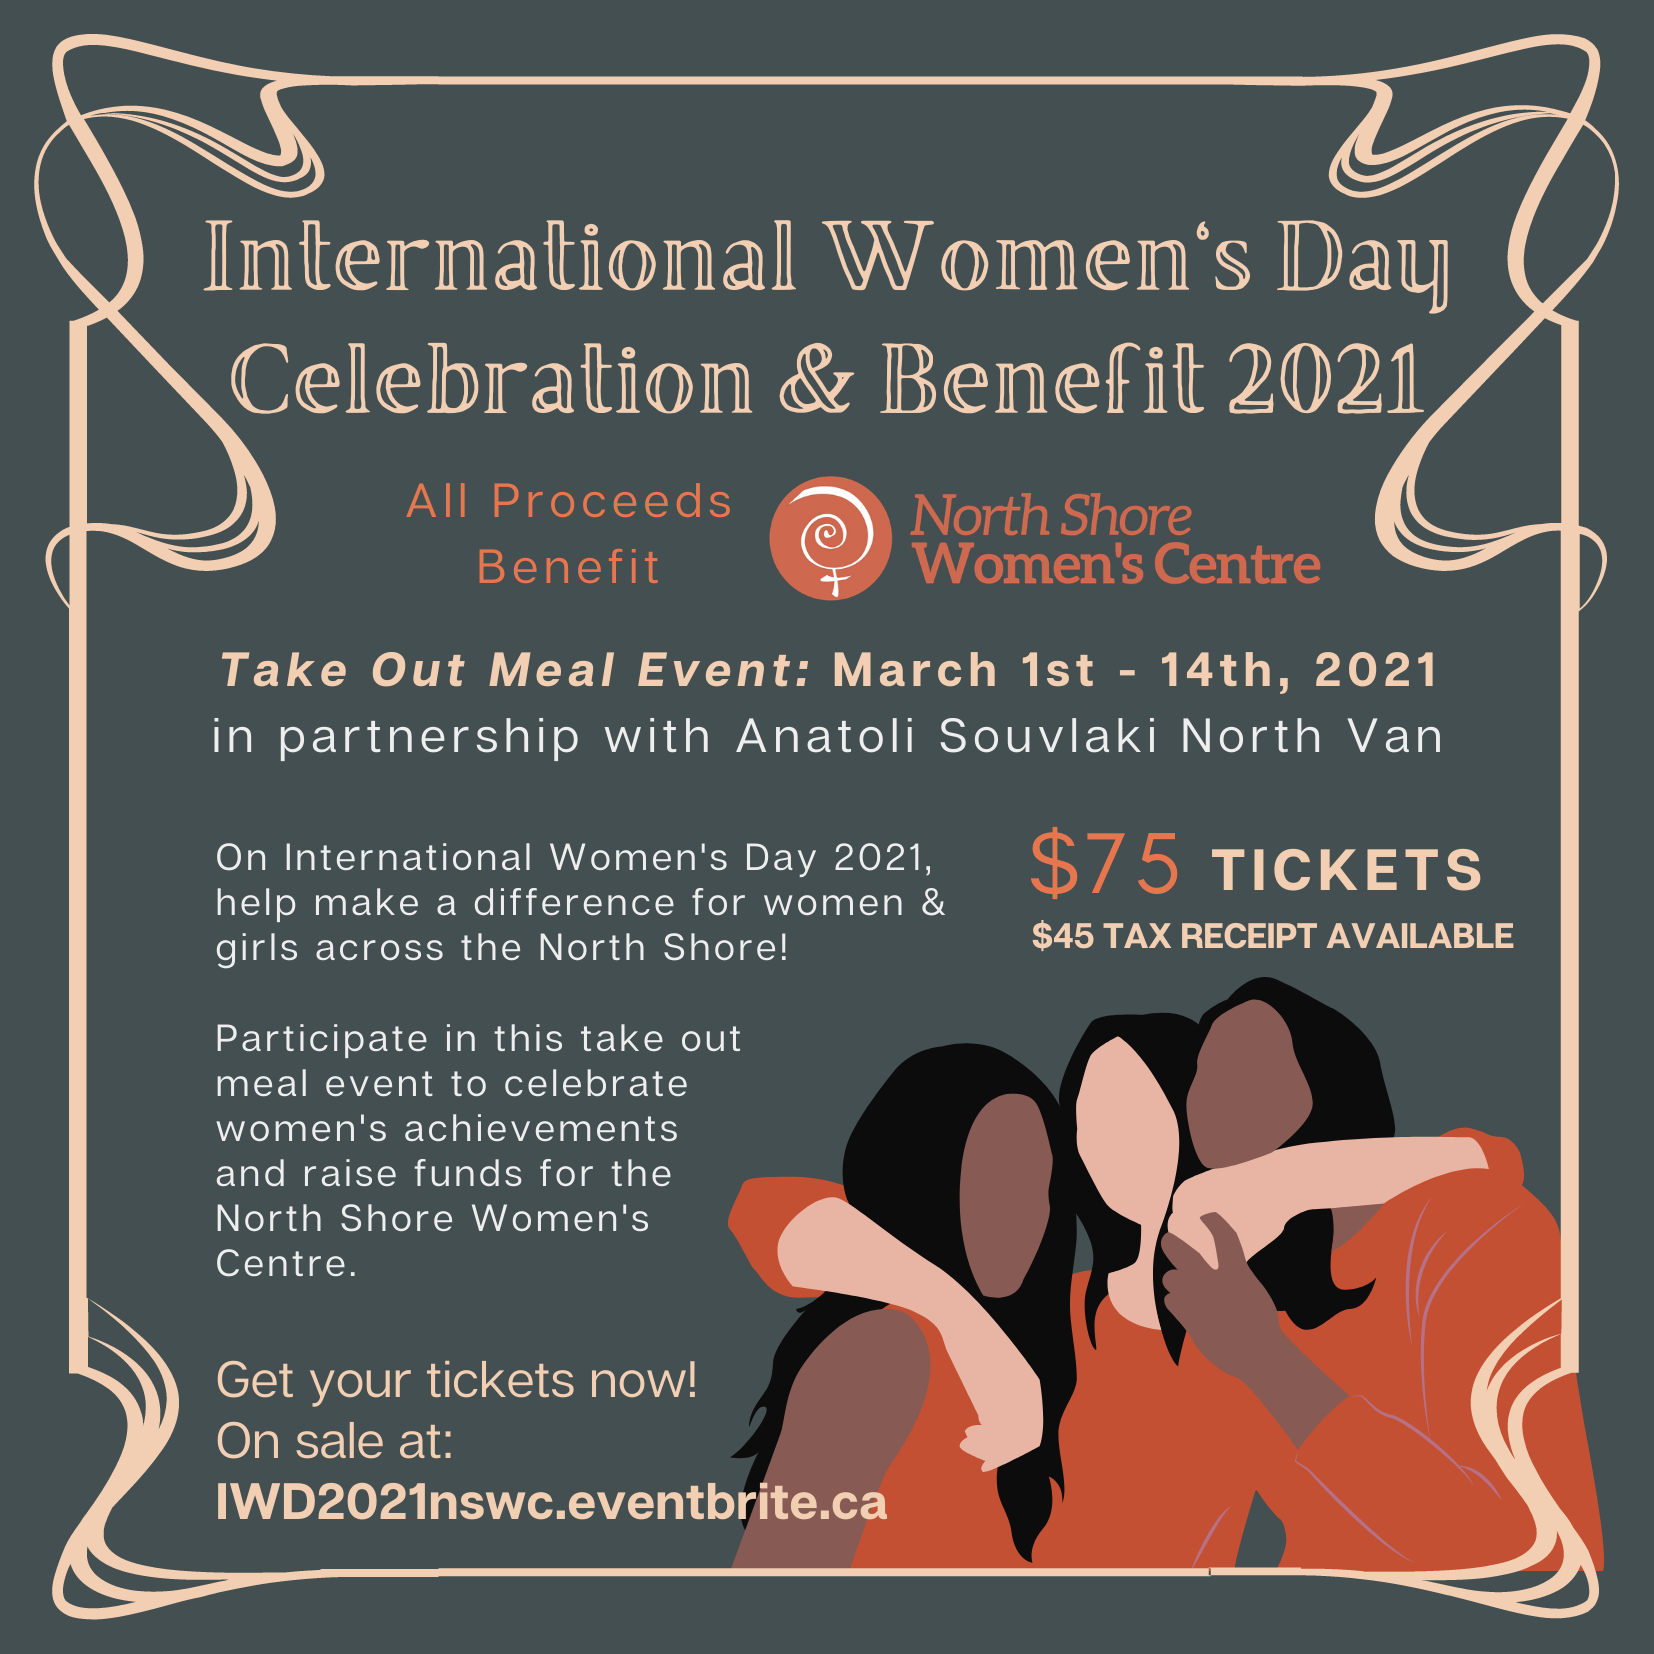 International Women's Day Celebration & Benefit 2021